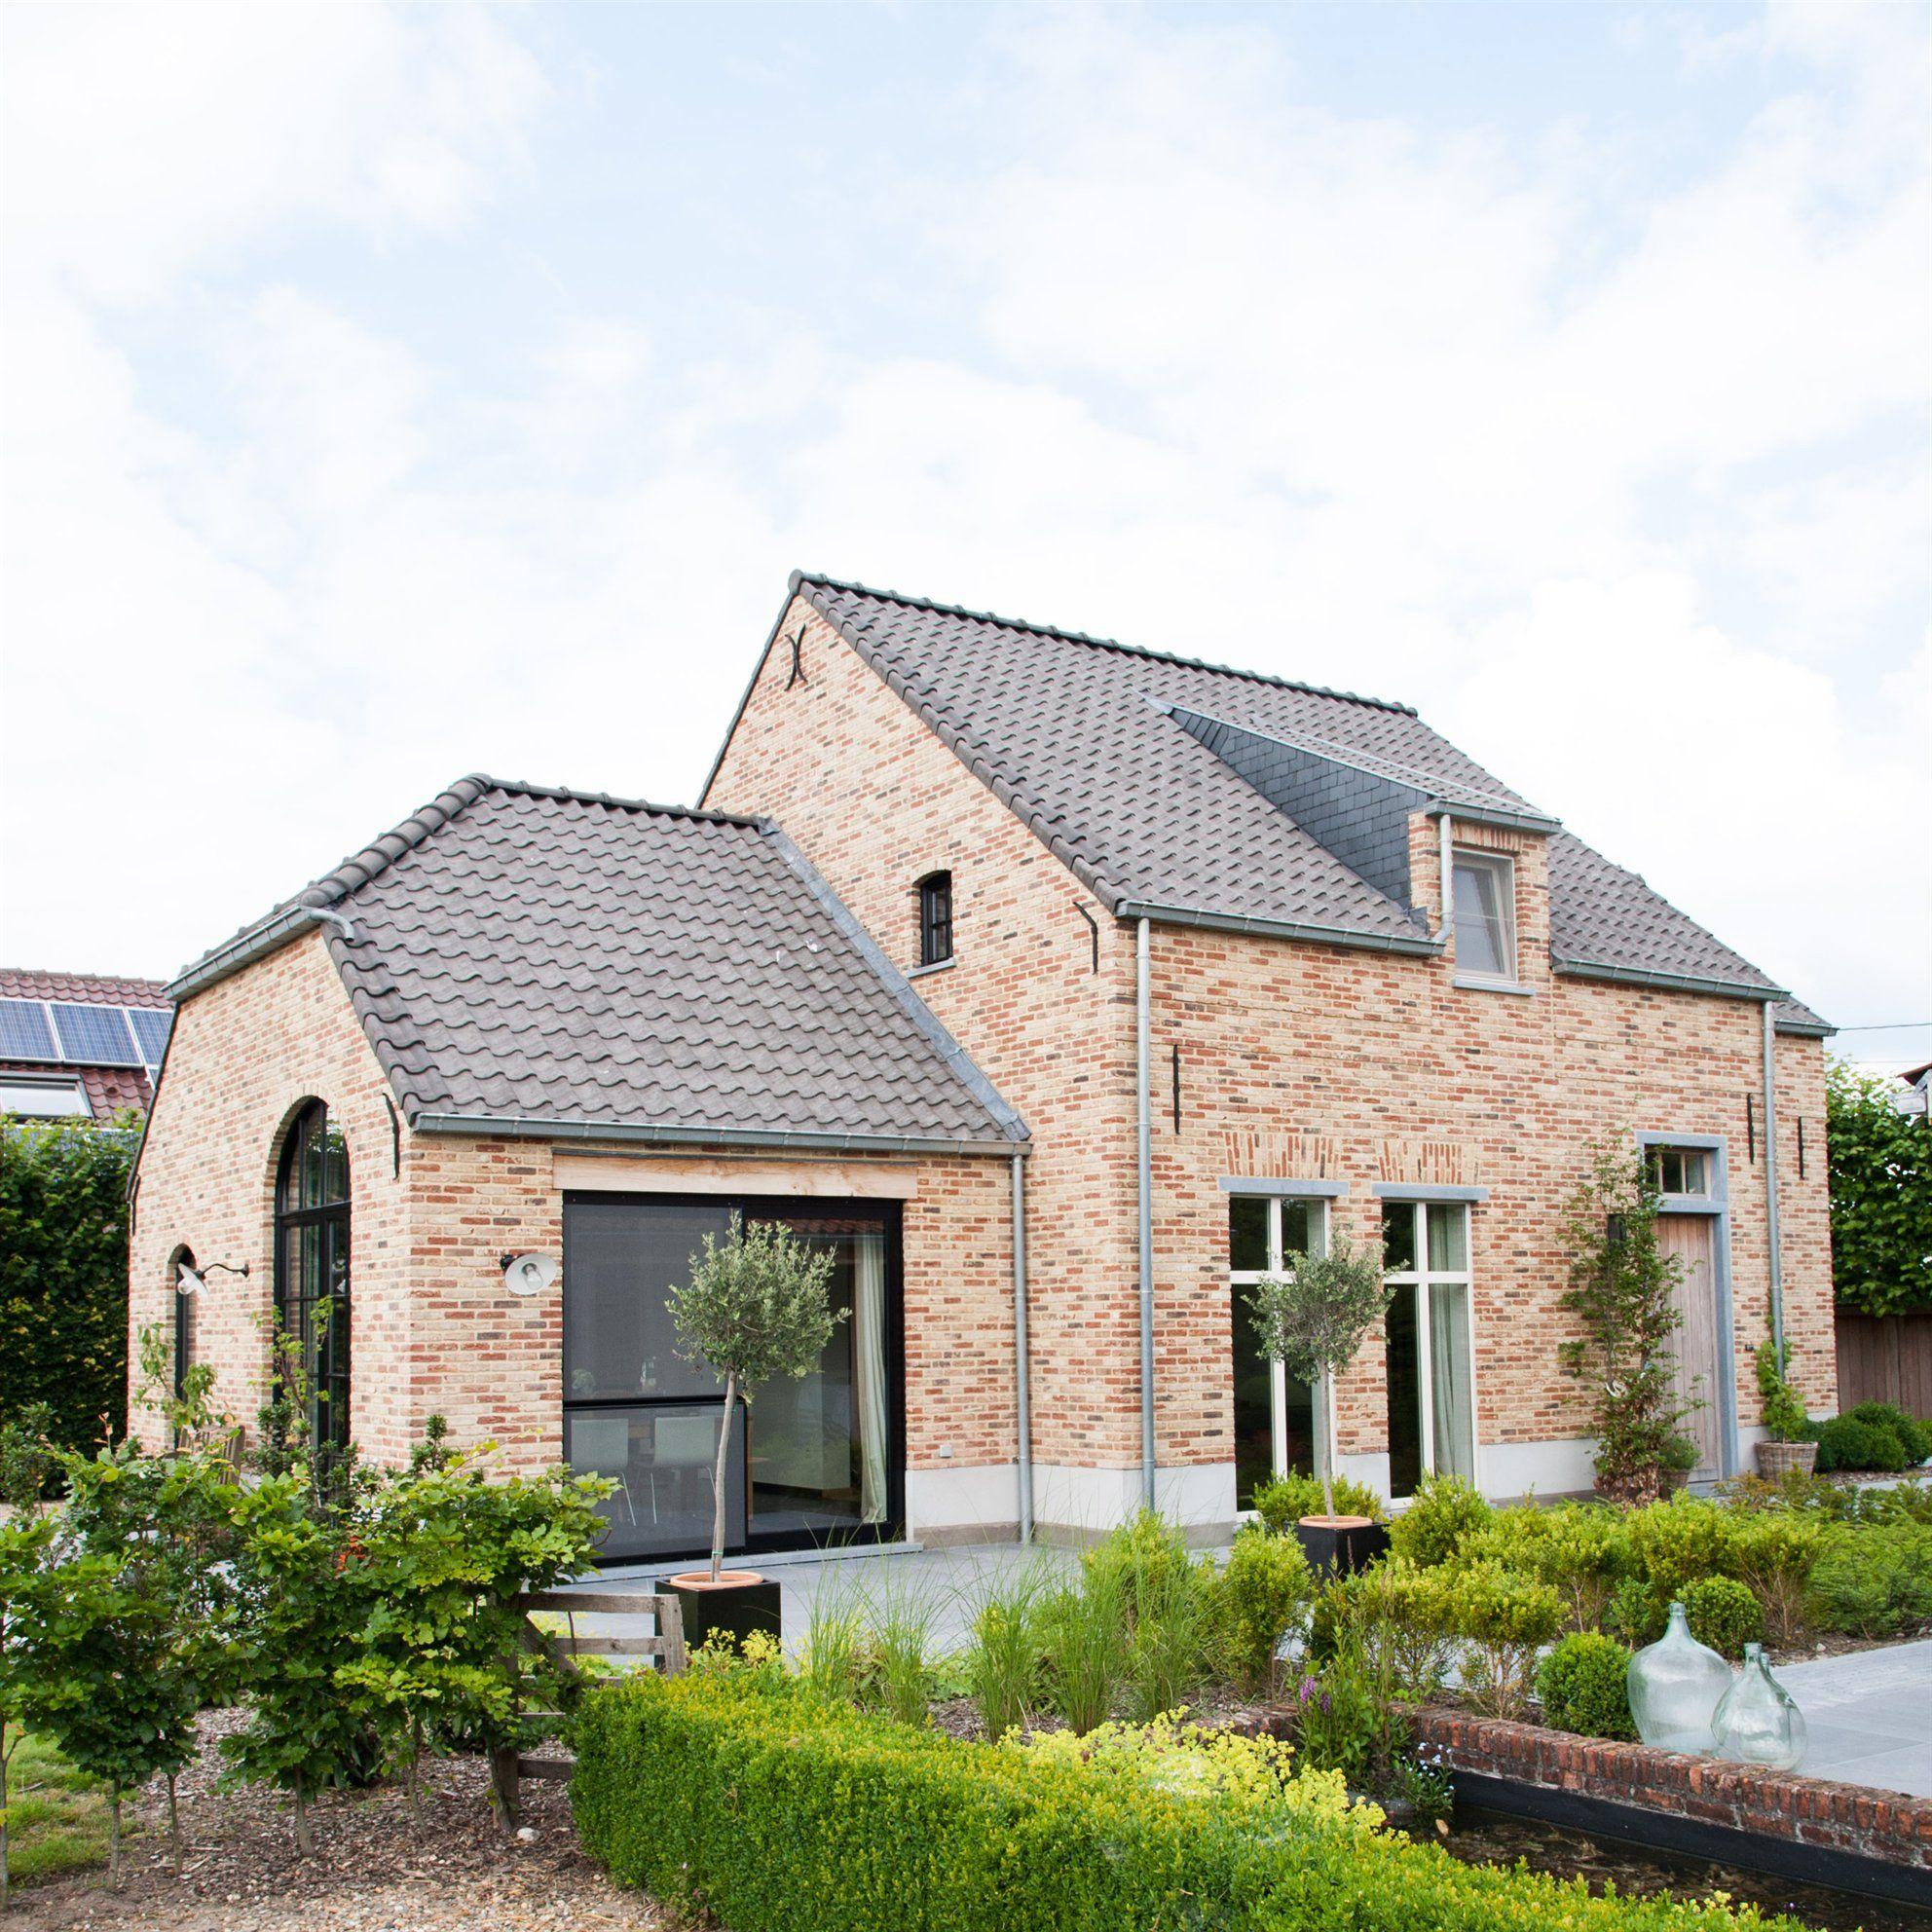 Interieur I Binnenkijken I Moderne Bungalow In Ermelo: Landelijke Villa